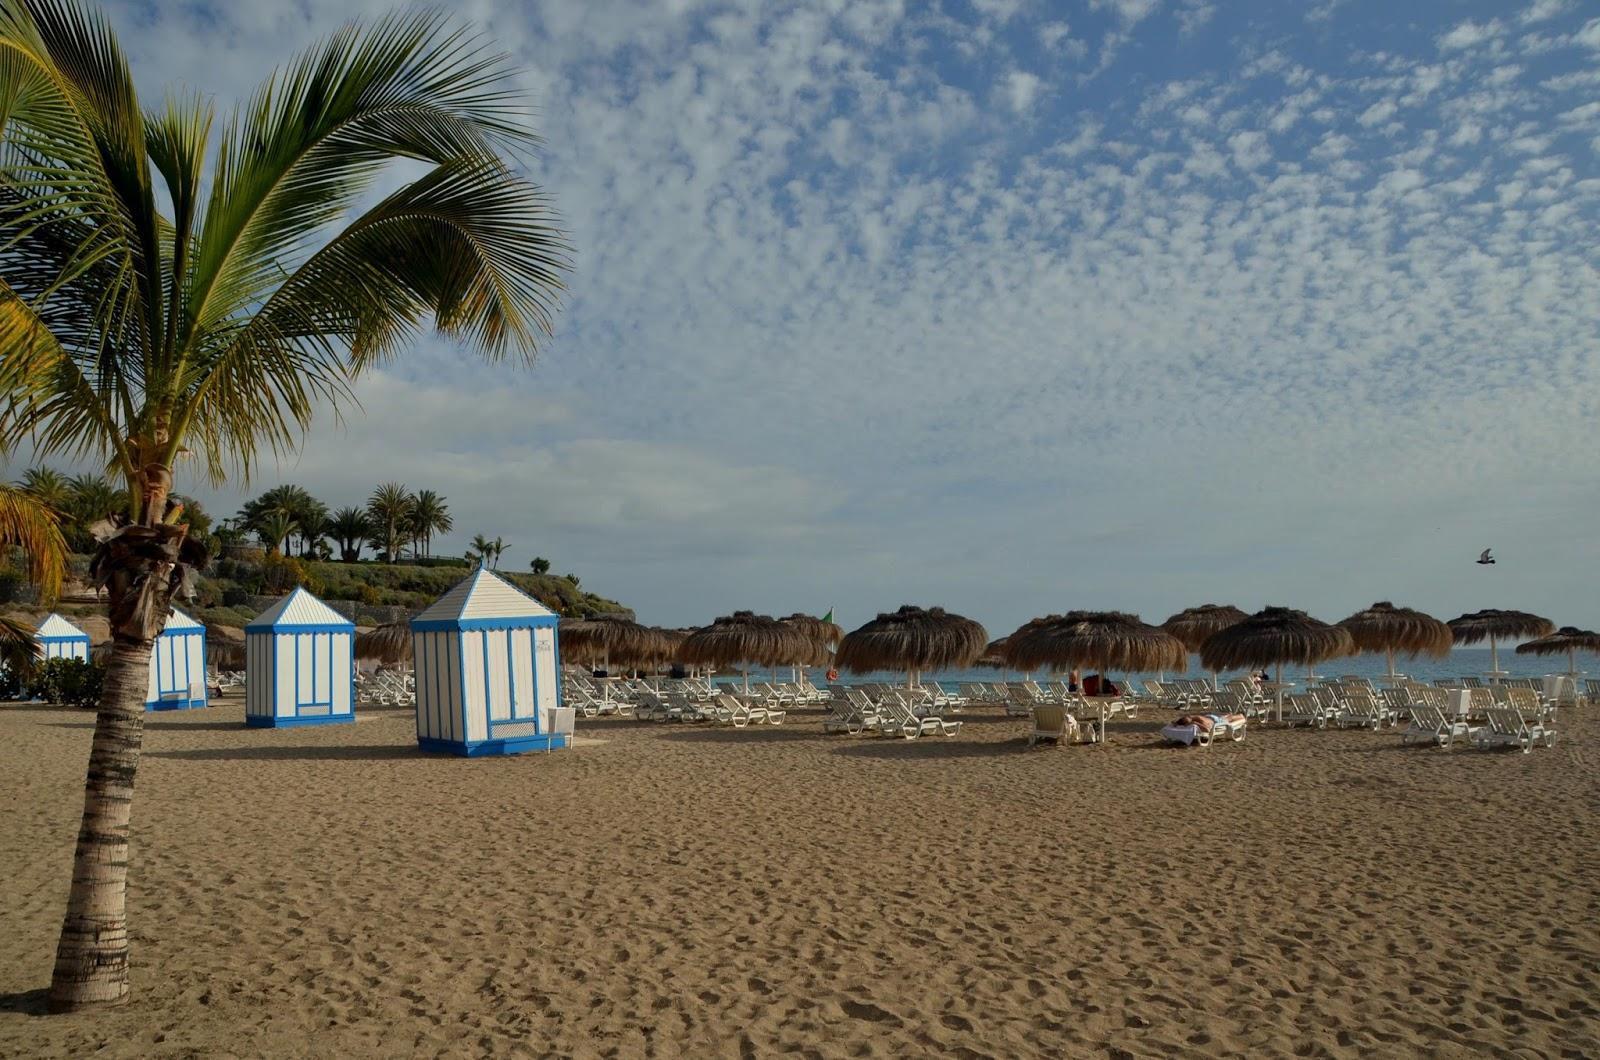 teneryfa plaża